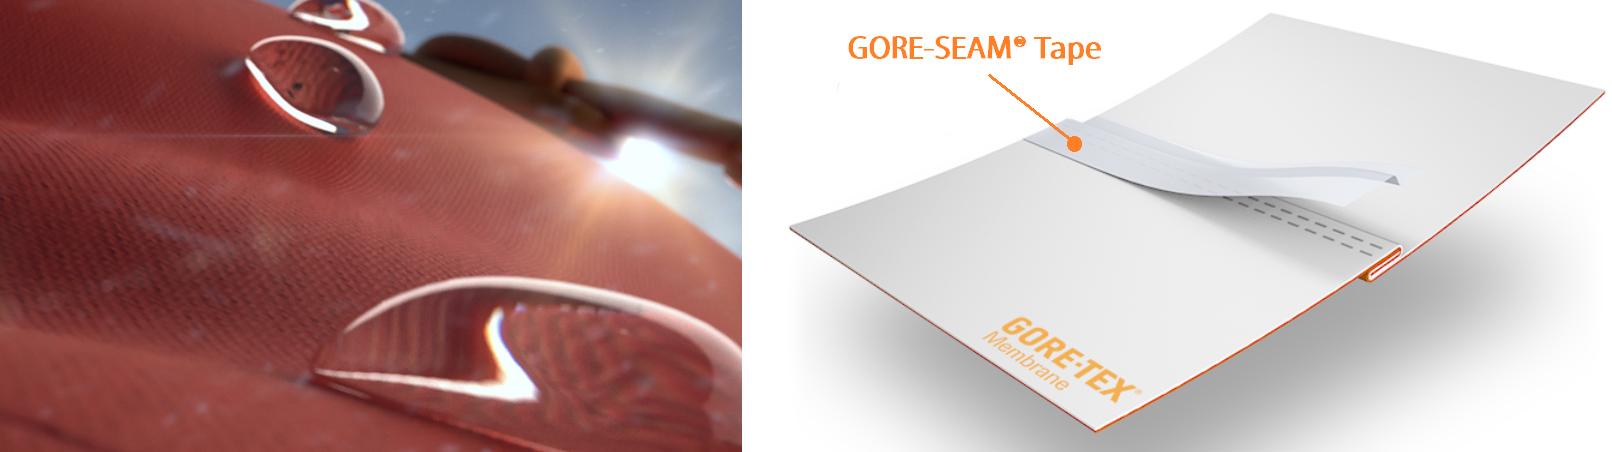 gore-seam-tape